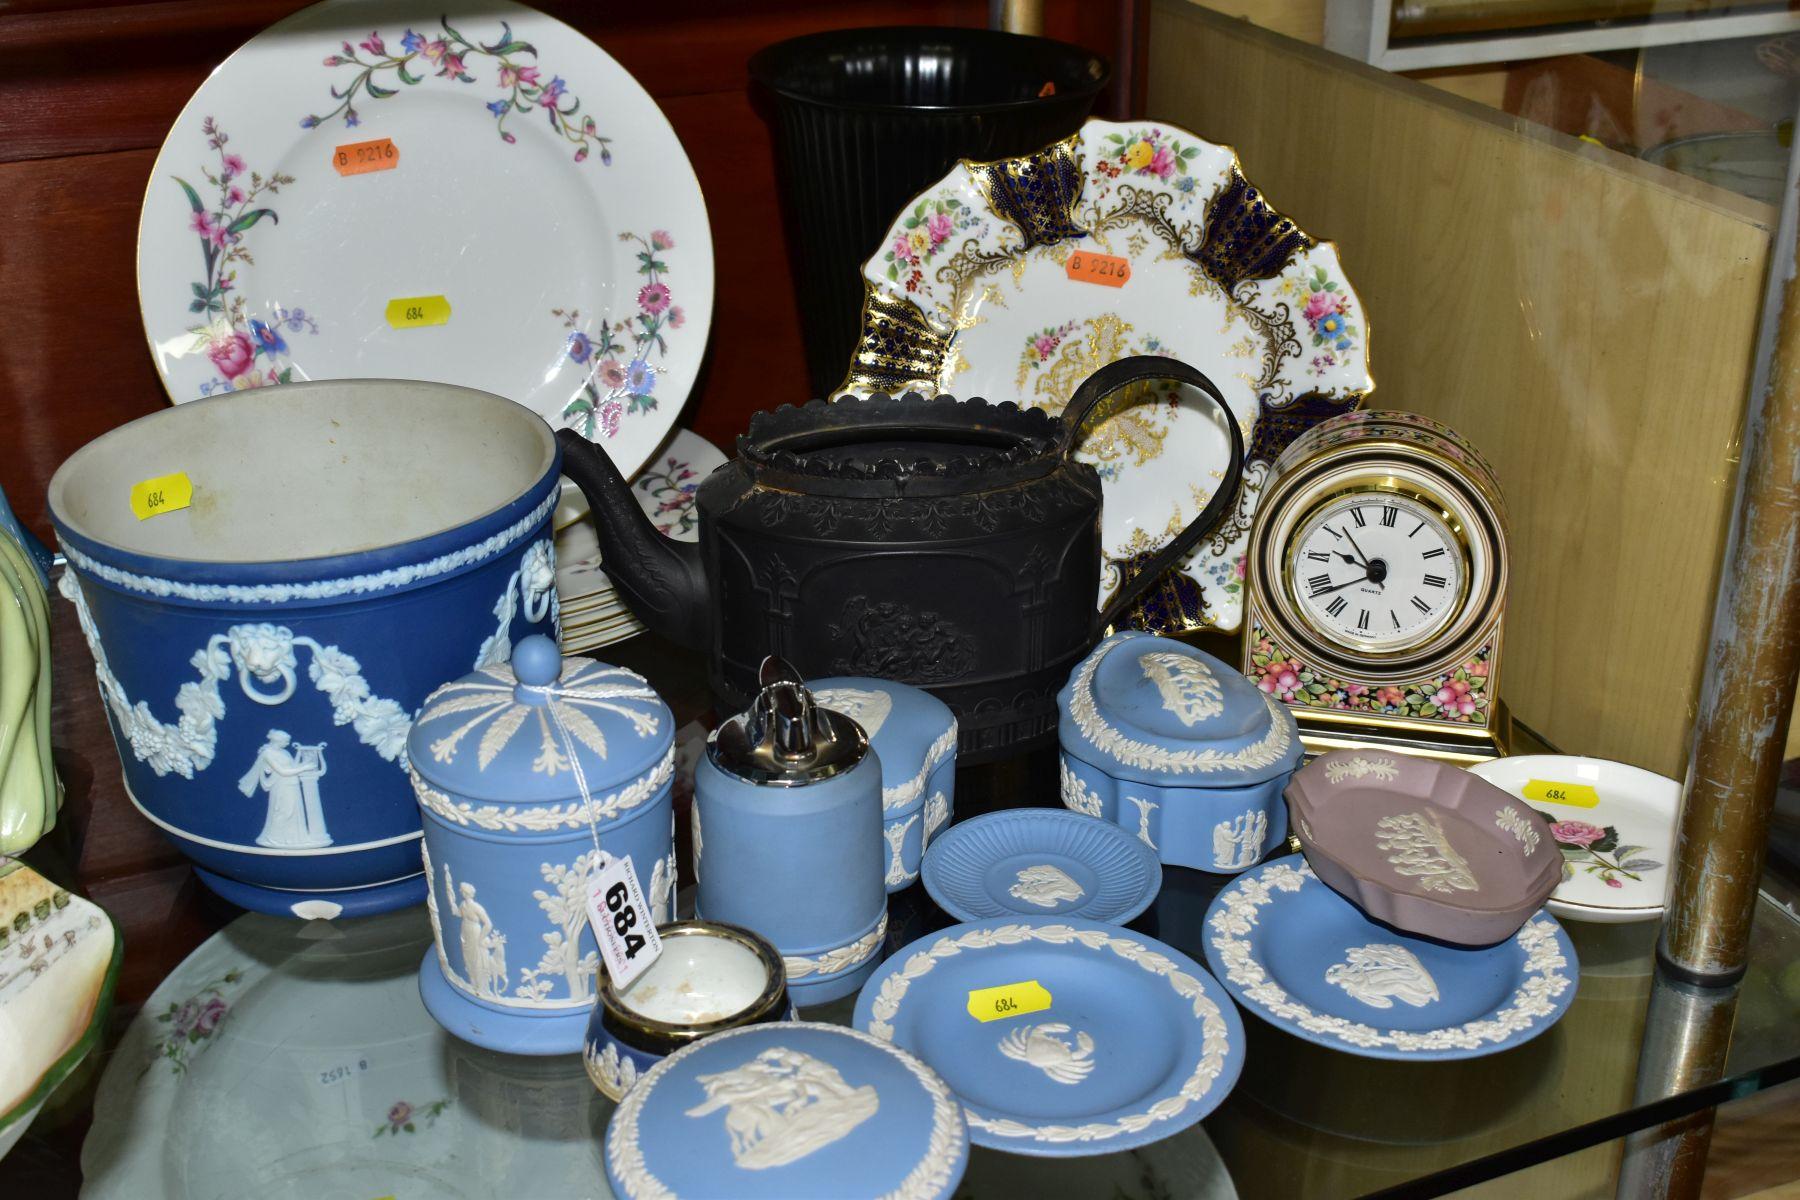 CERAMICS to include blue jasper ware trinkets, etc, Wedgwood Clio clock, black basalt teapot with